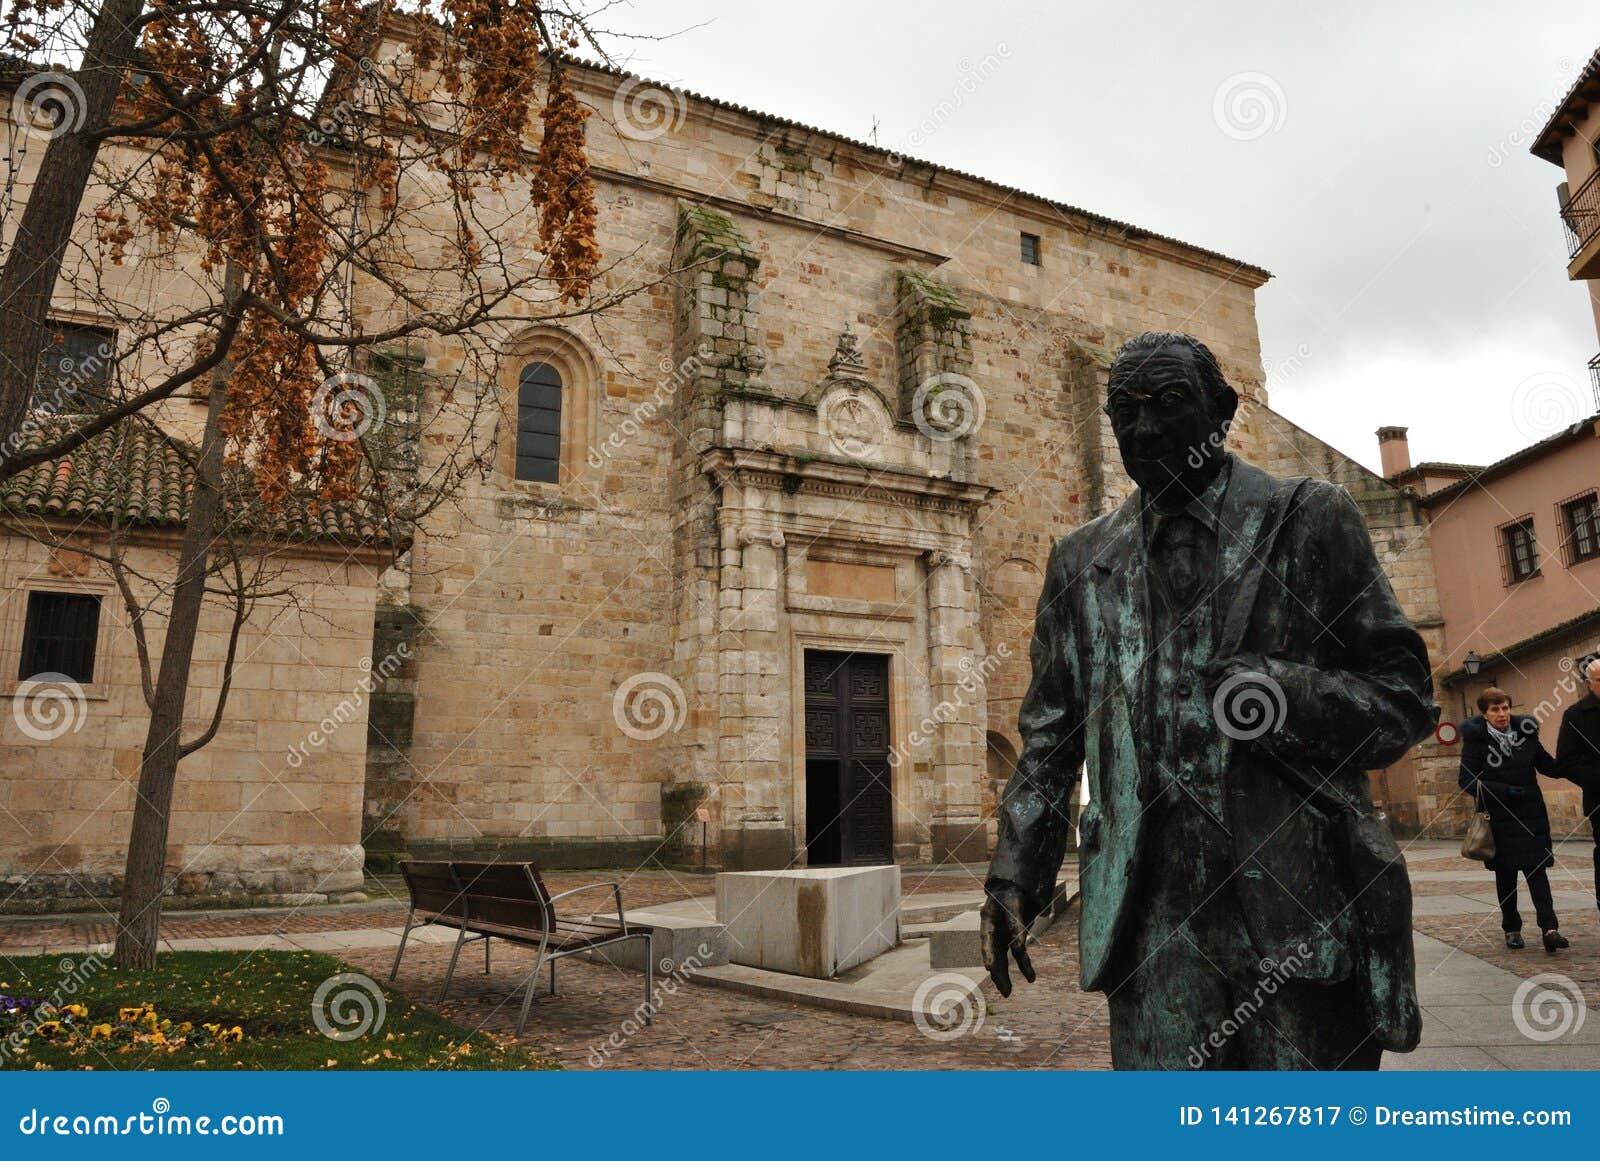 Estatue和圣伊尔德丰索教会,萨莫拉,西班牙